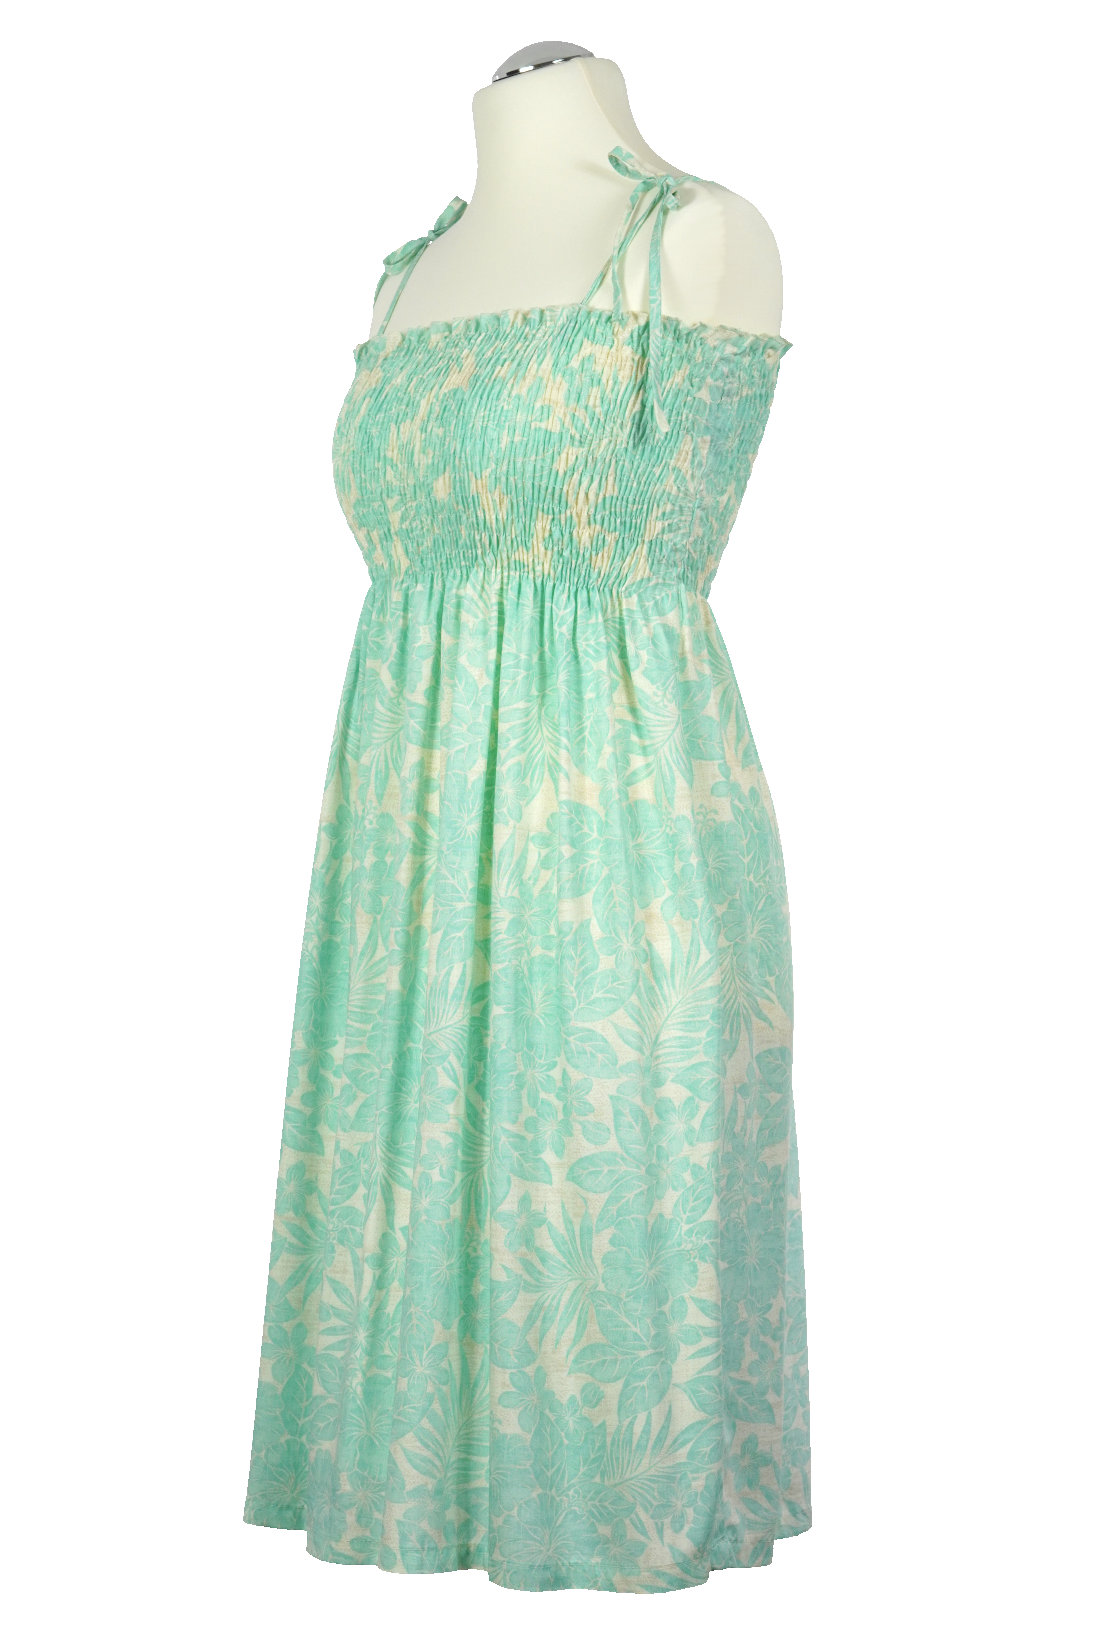 -Hidden Flower - original Hawaii Tube Dress | midi